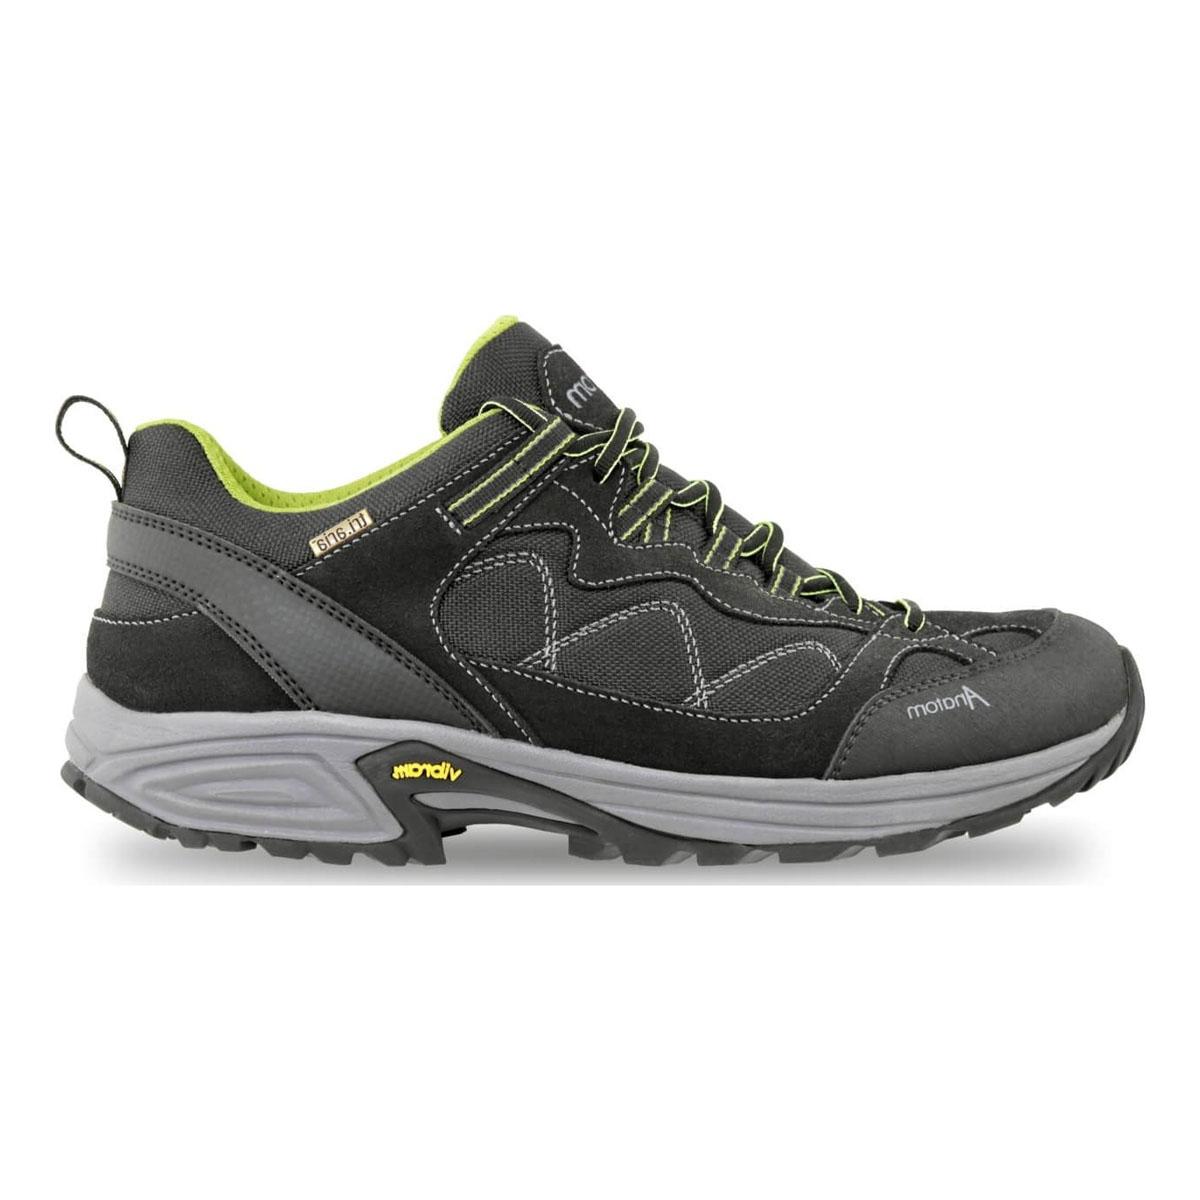 27b1da6c78c Anatom S1 Skye Trail Walking Shoes (Men's) - Black/Green